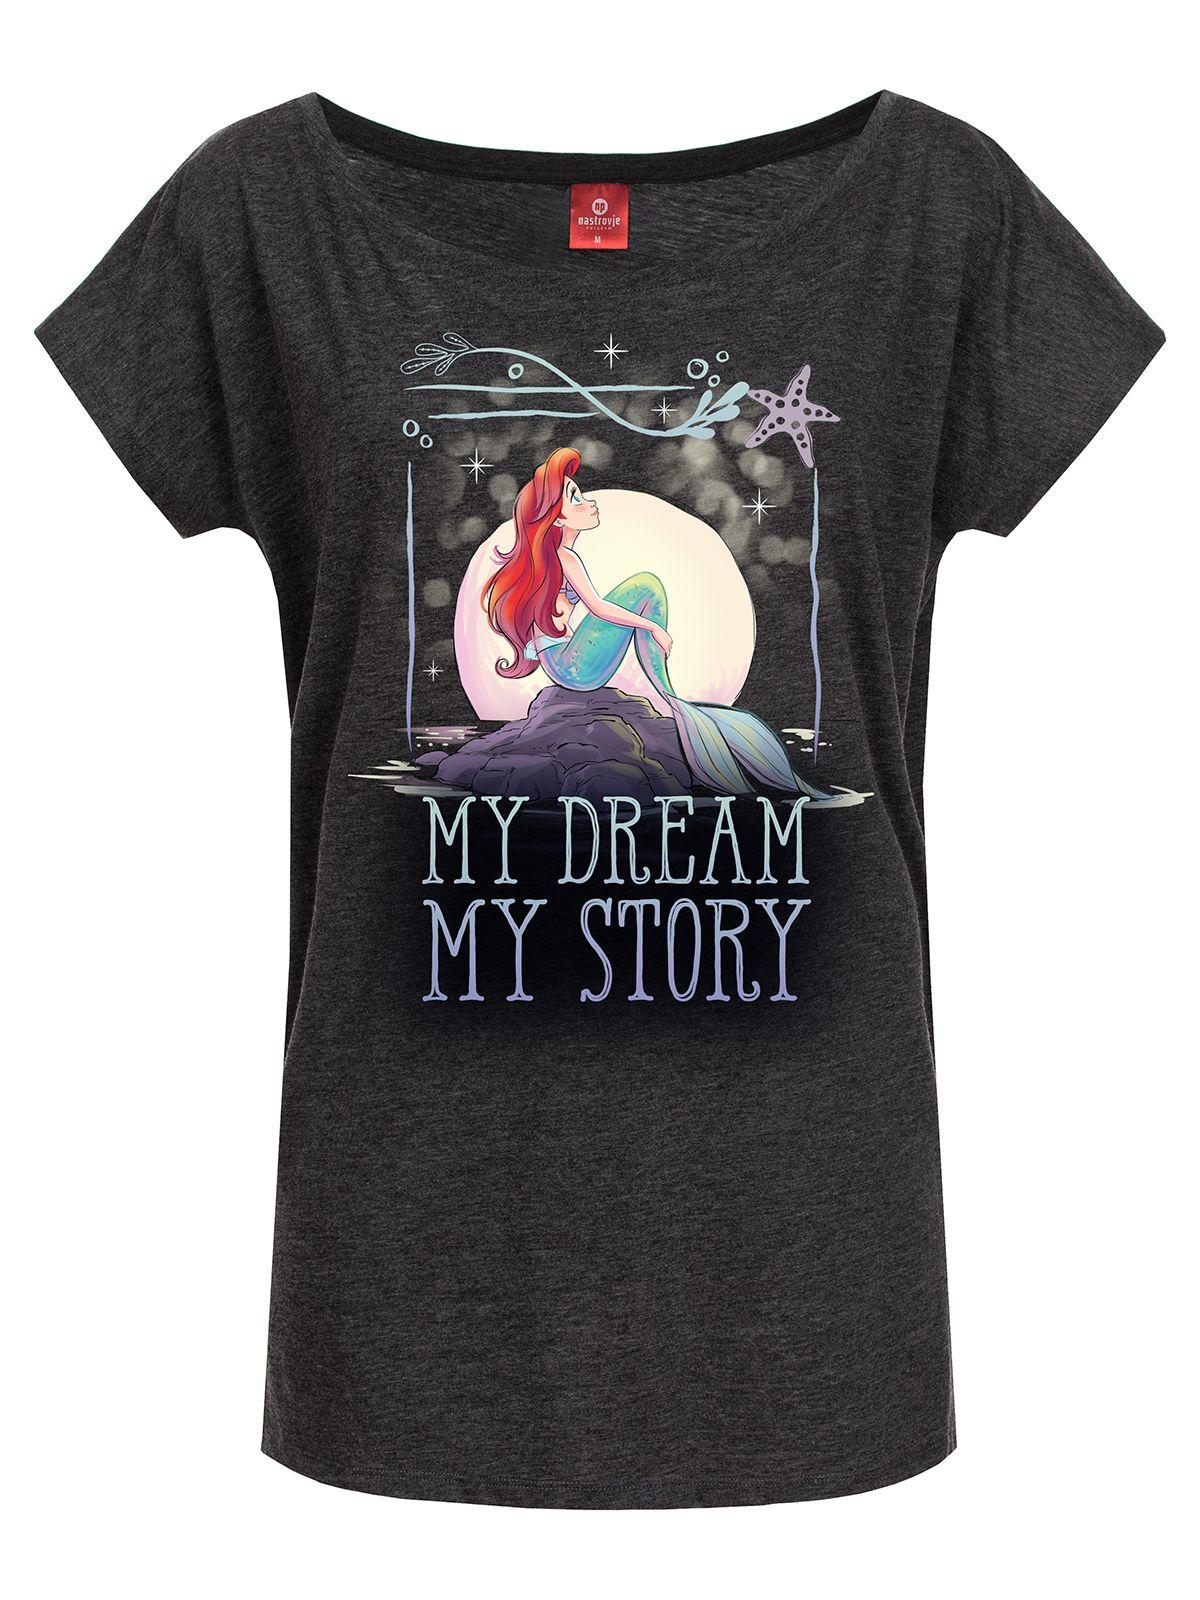 Oberteile - Arielle My Dream Girl Loose Shirt grau meliert – Größe XL  - Onlineshop NAPO Shop